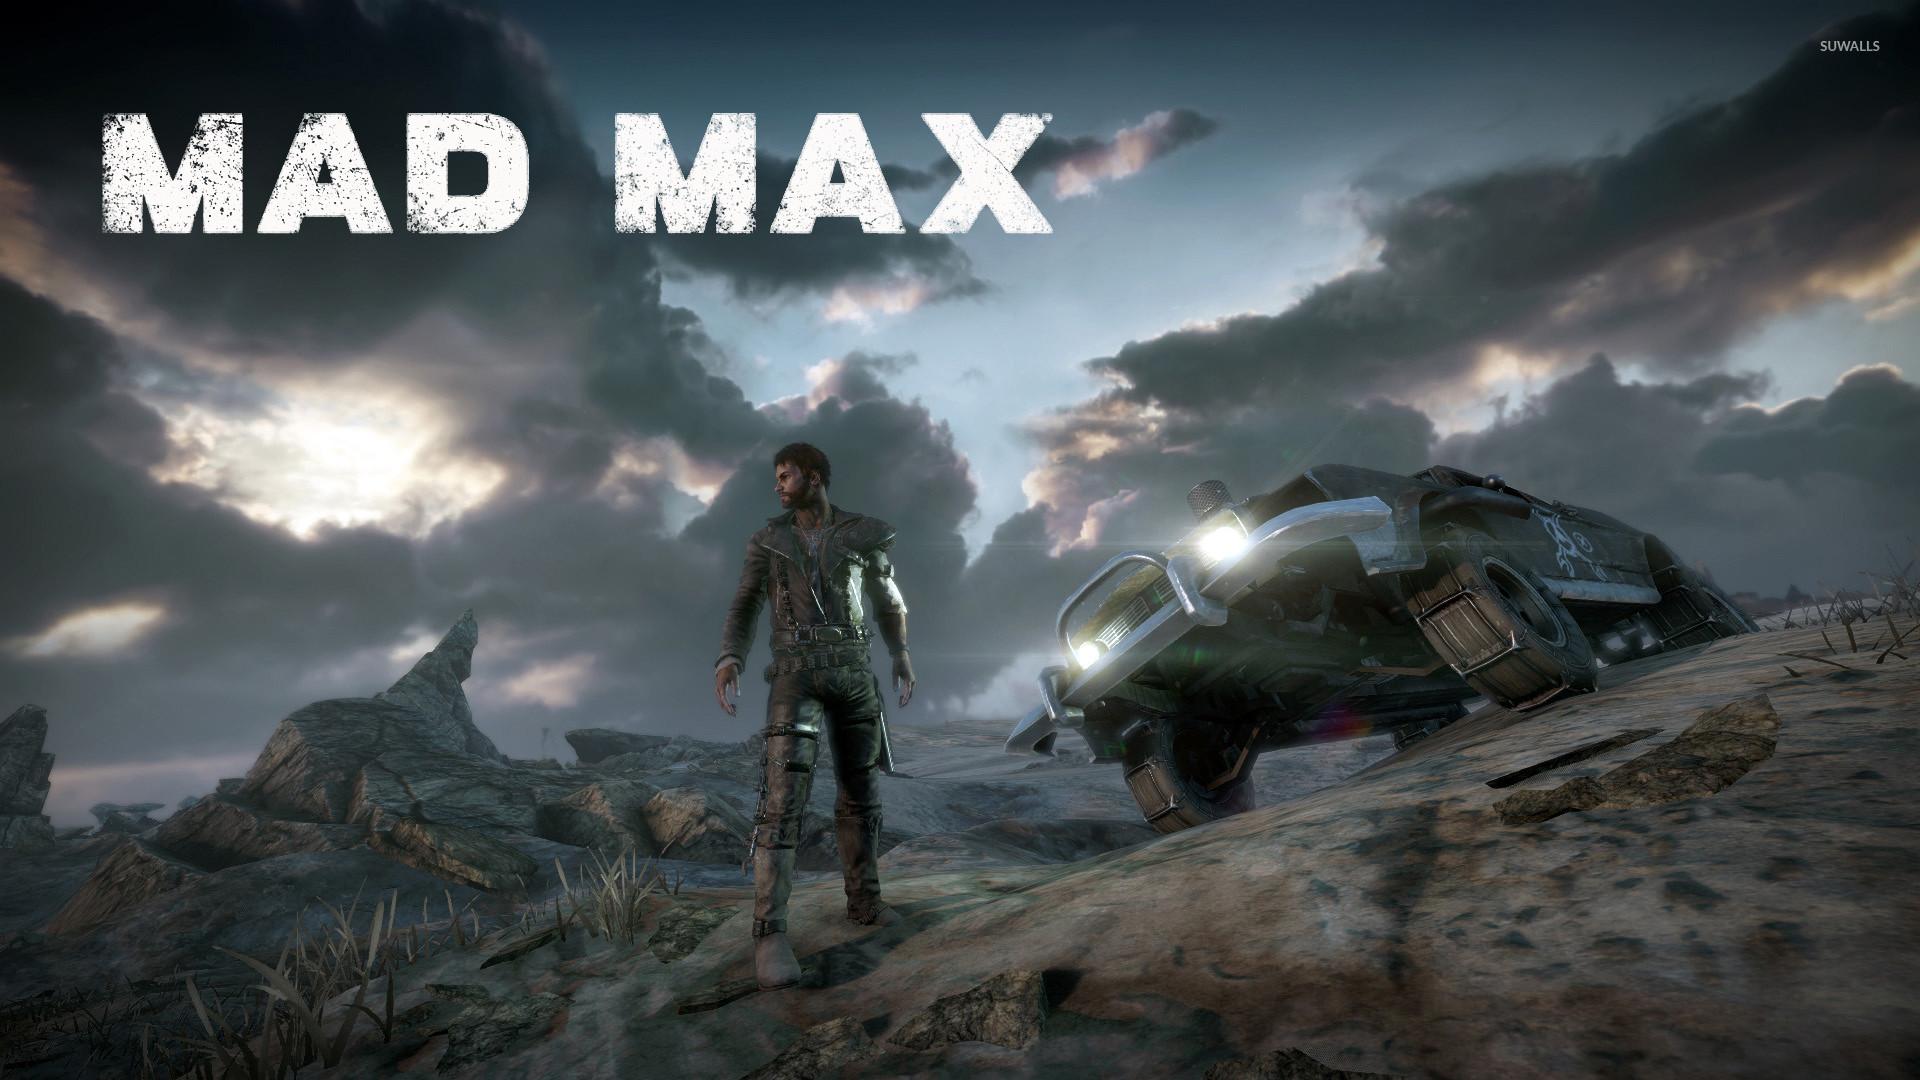 Max in the twilight – Mad Max wallpaper jpg